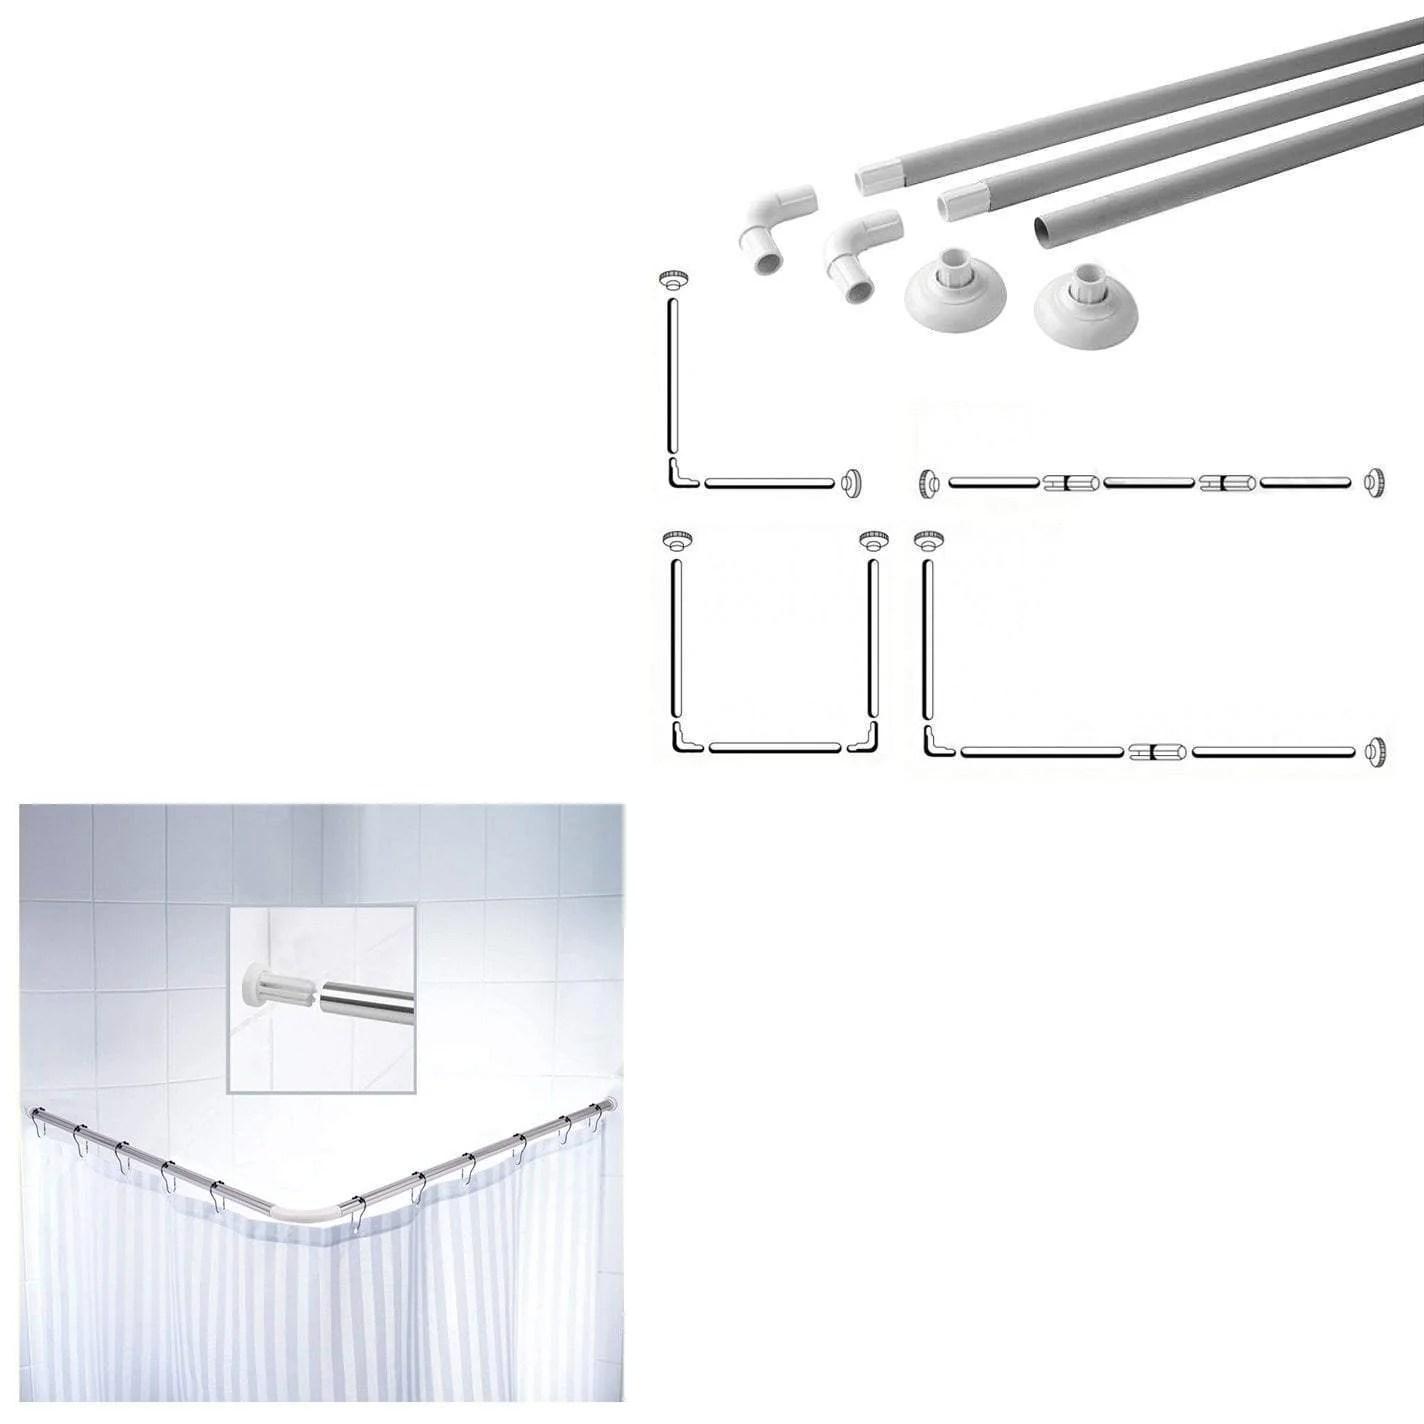 Bathroom Corner Shower Curtain Rod 80 X 80 X 80cm 0316 Parcel Rate